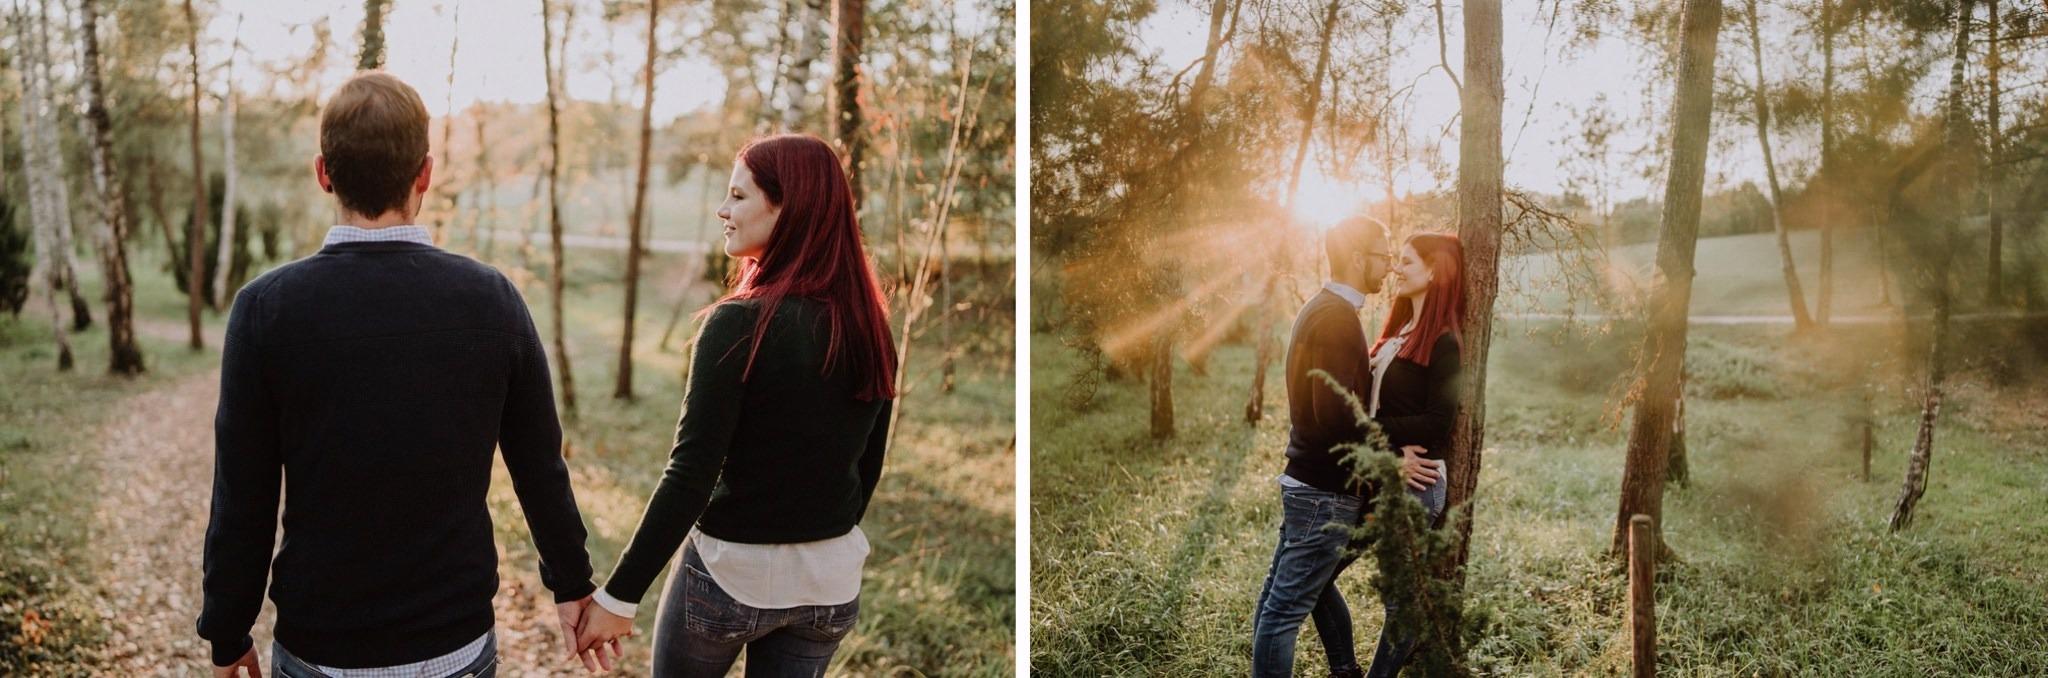 wedding photographer hamilton new zealand 1010 1